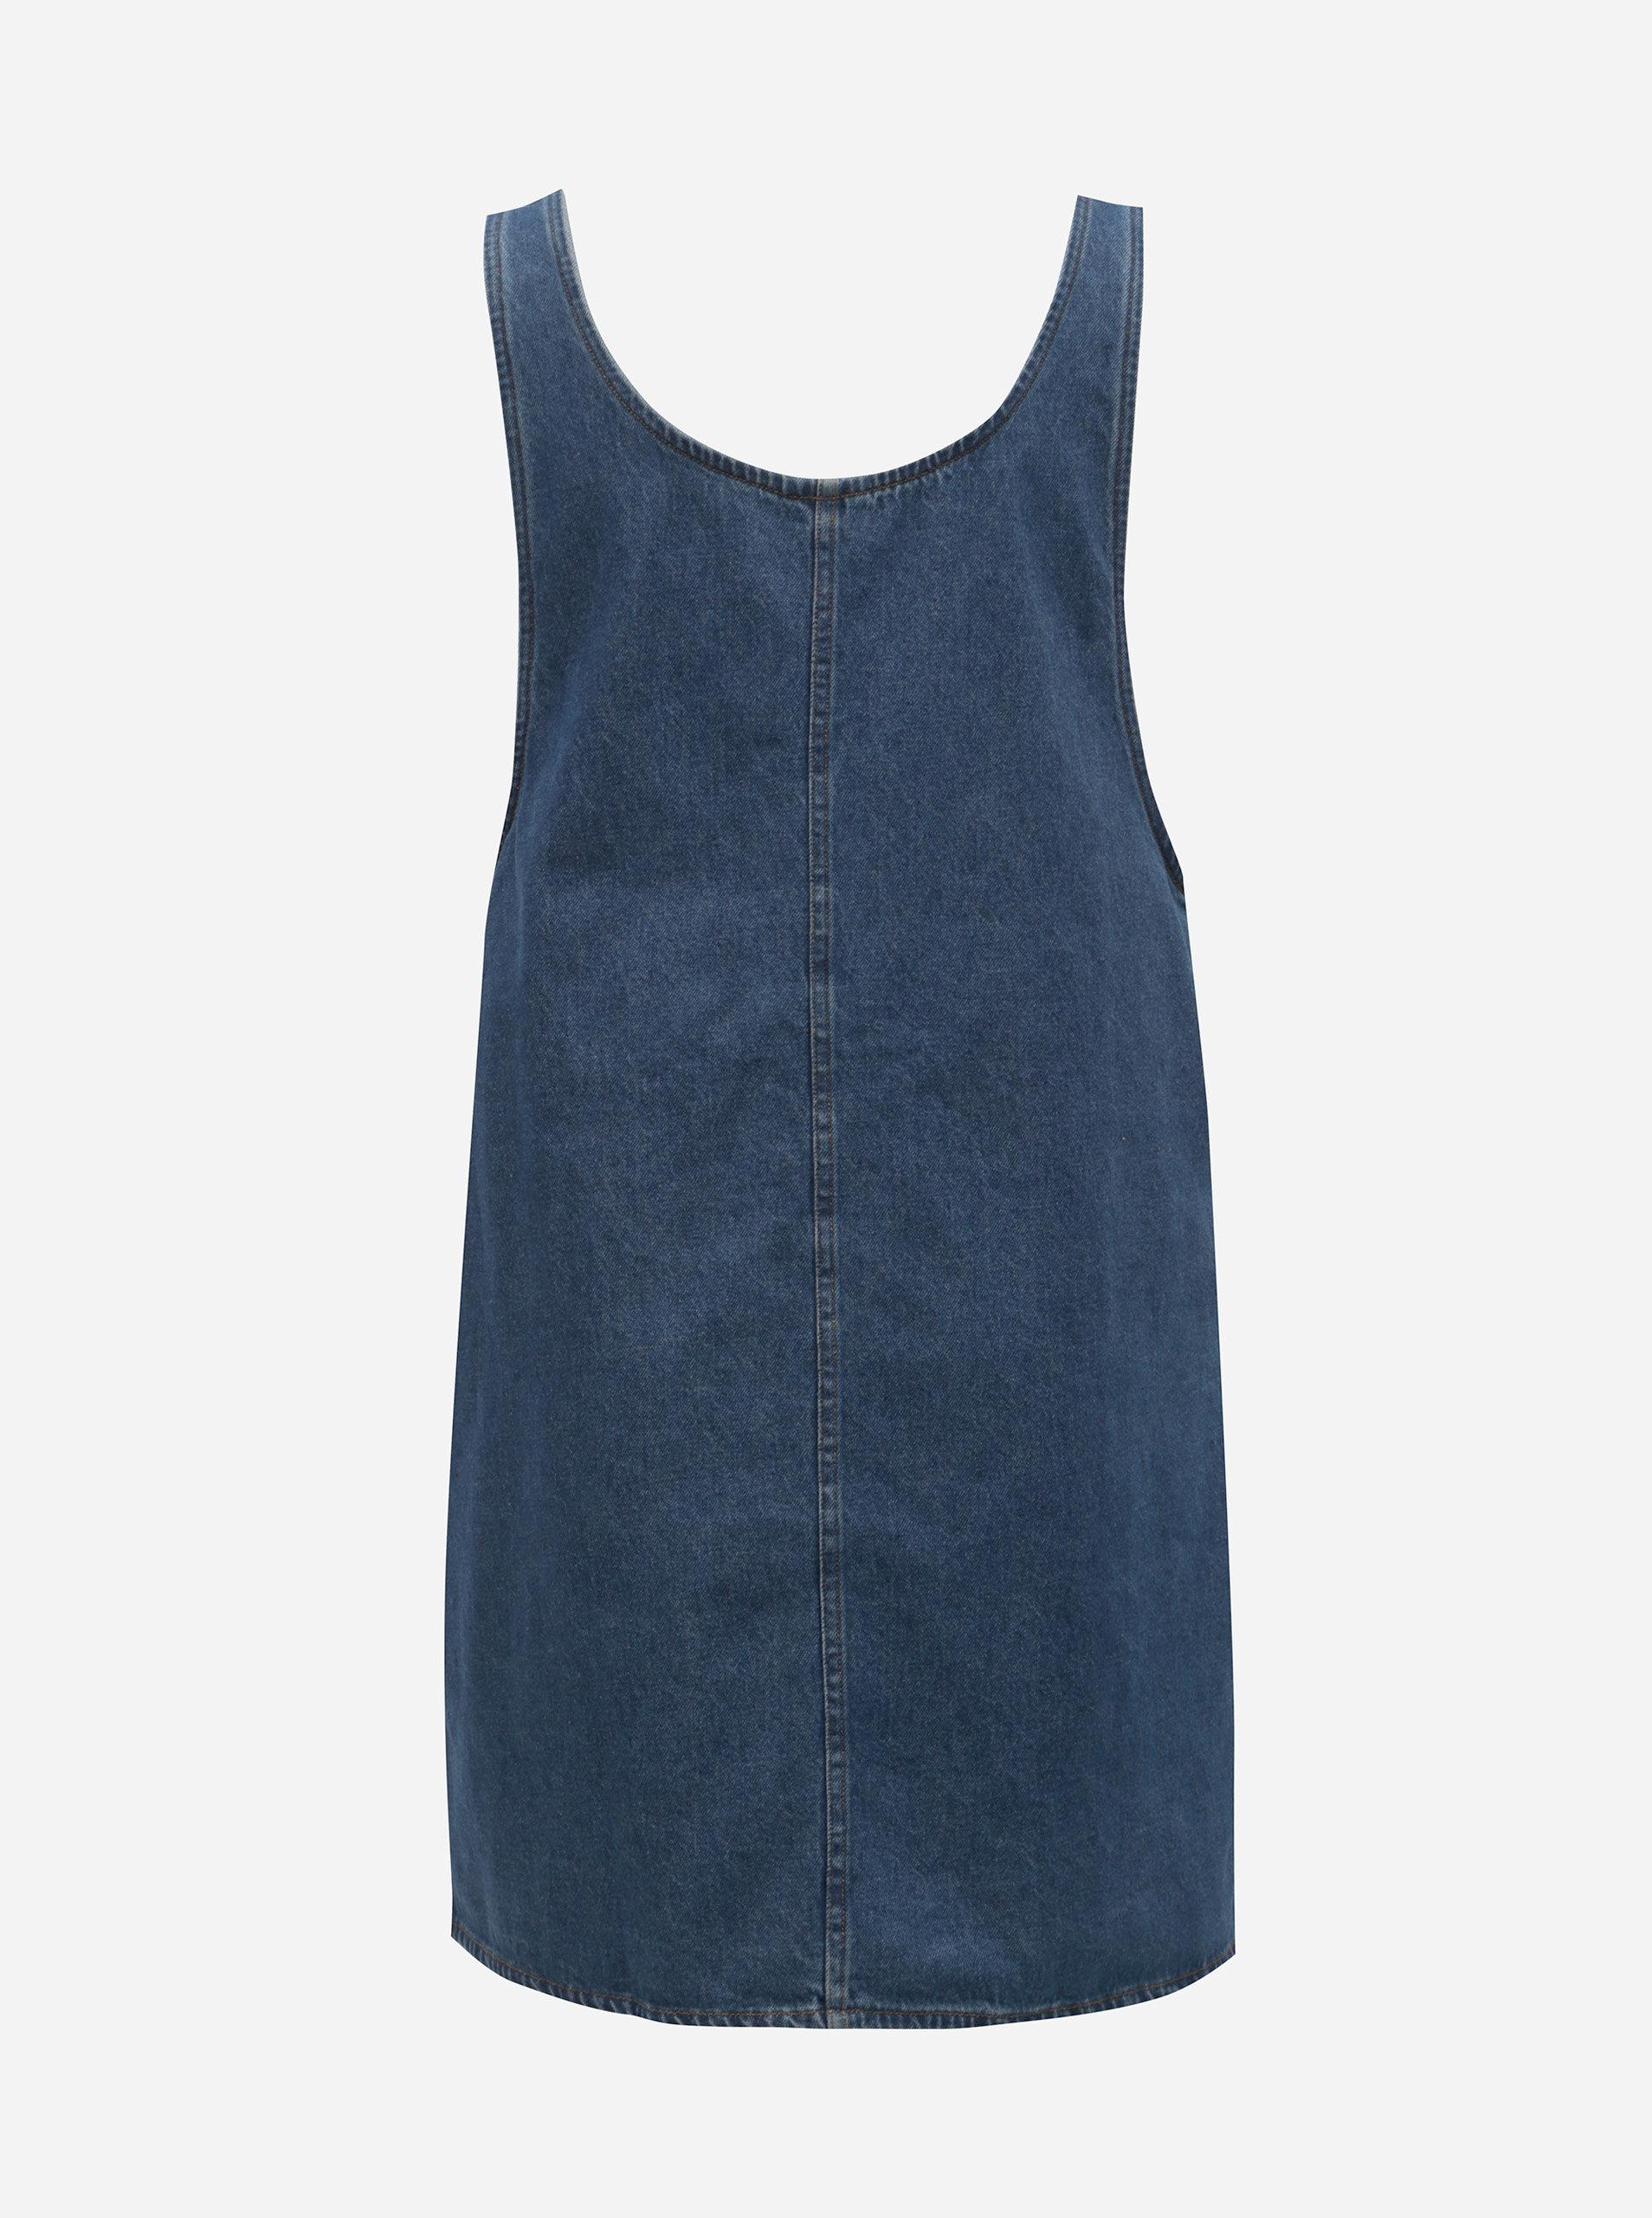 cac671f0a6e Modré džínové šaty s kapsami Noisy May Wilda ...